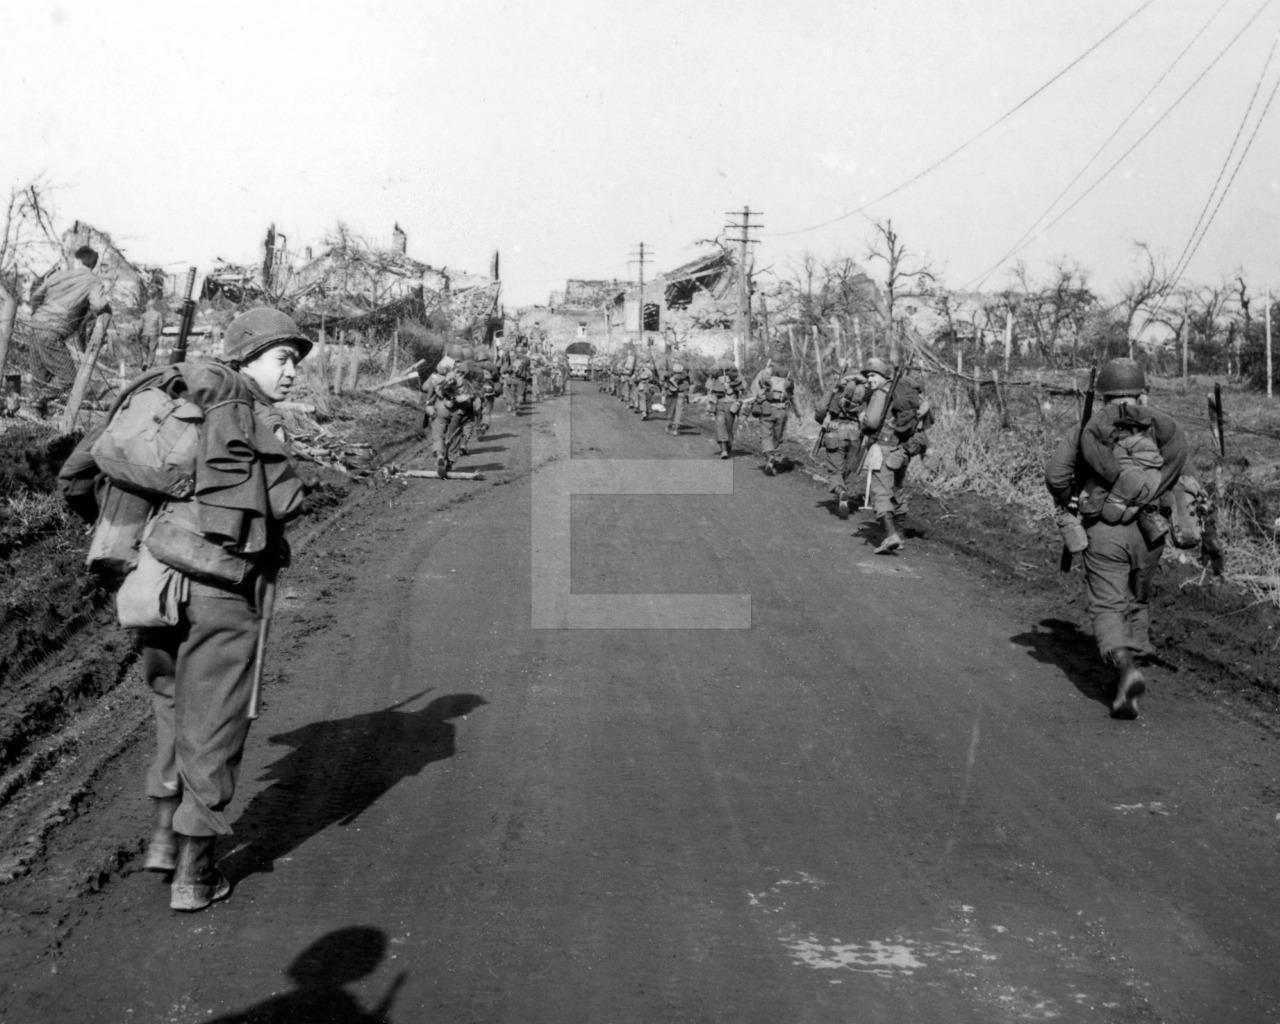 1945 WW2 Julich Germany 29th Army Infantry